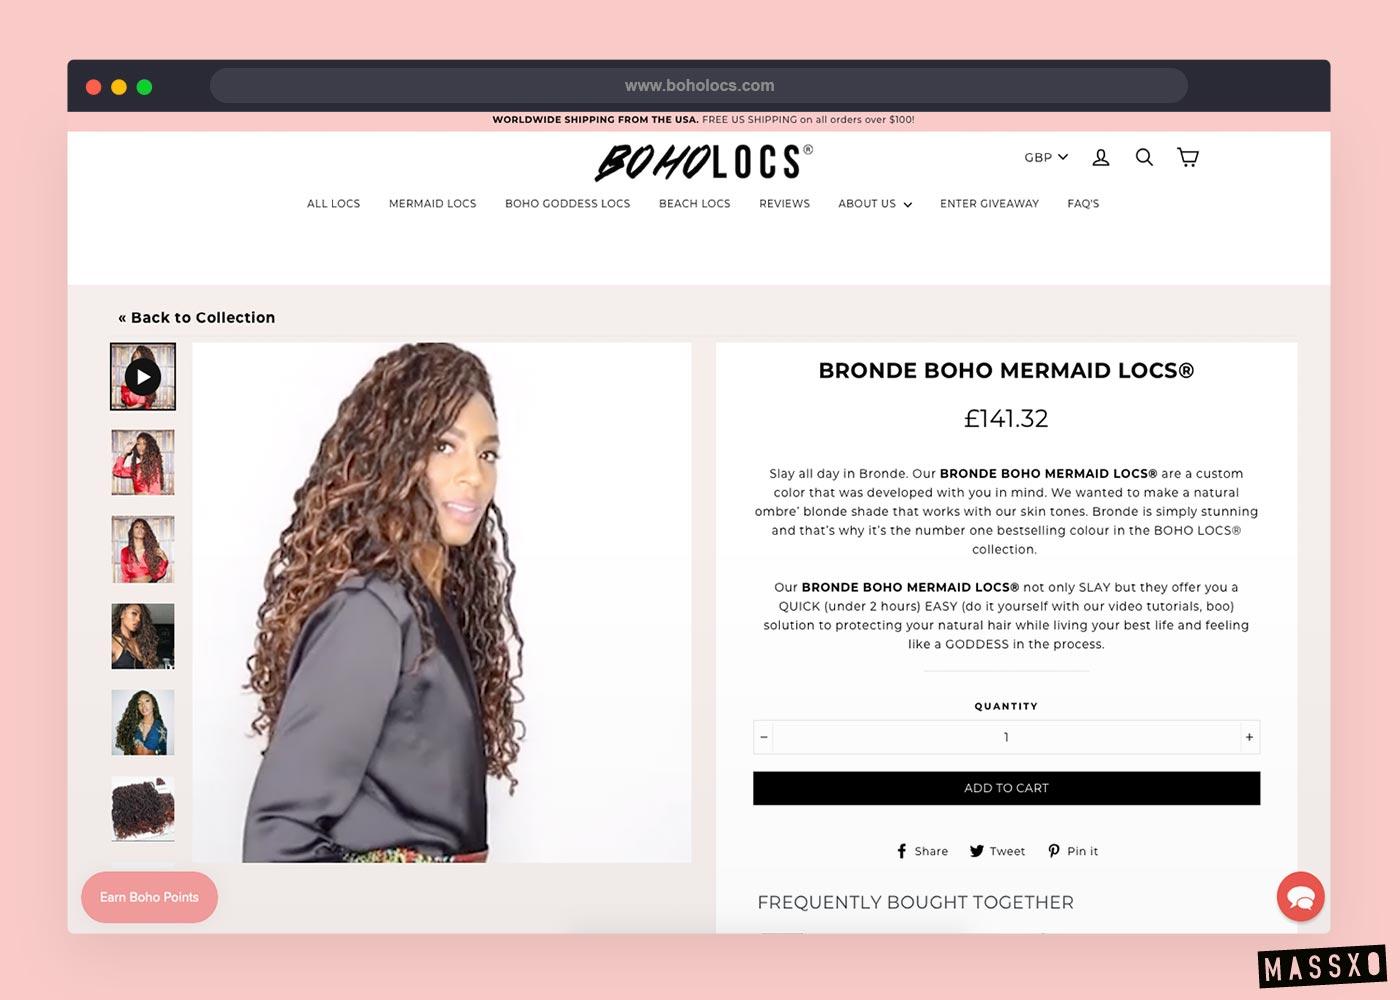 boholocs website design